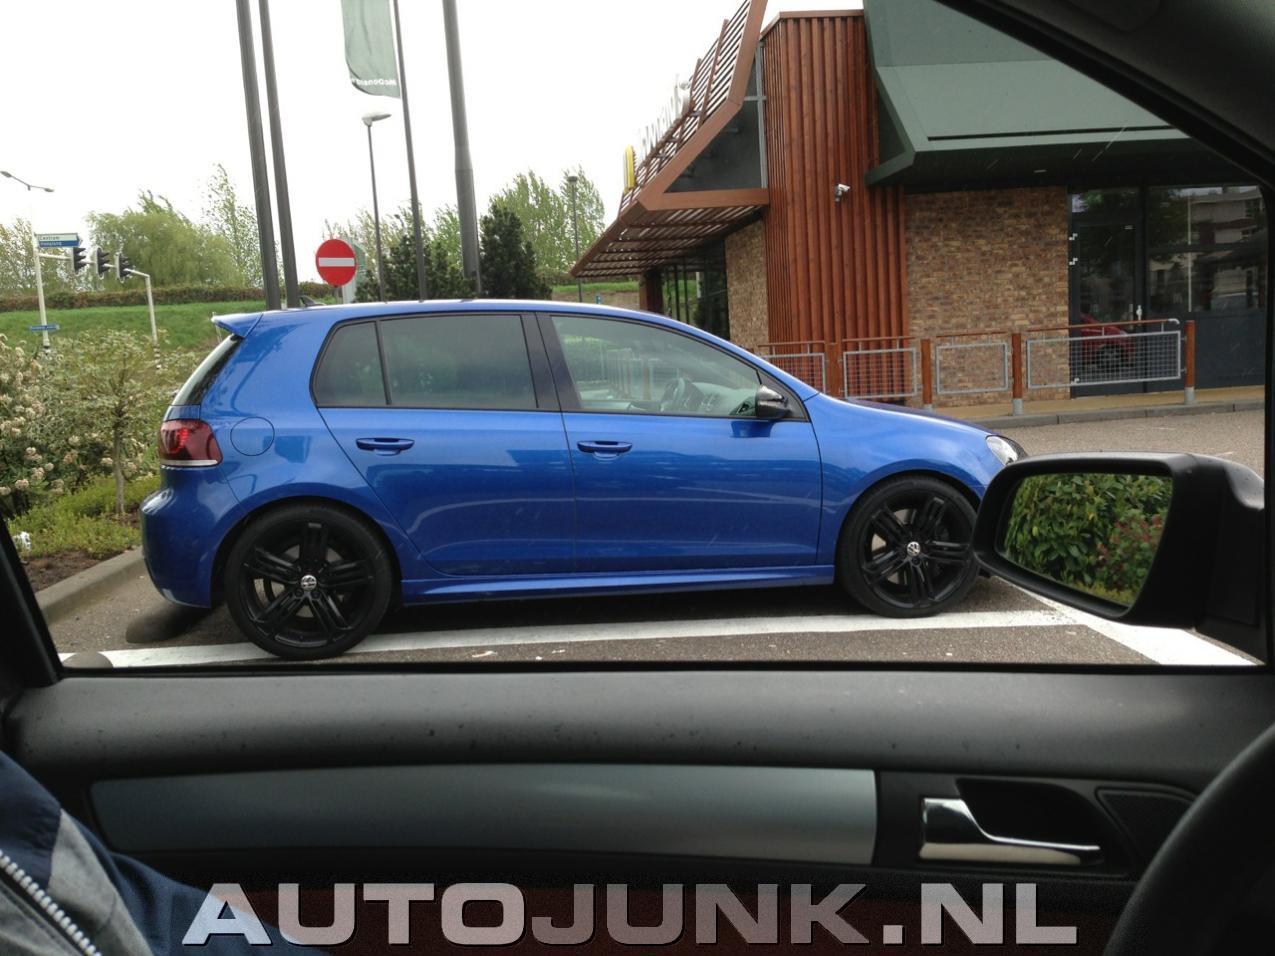 Uitgelezene Golf 6 R foto's » Autojunk.nl (94962) NS-08